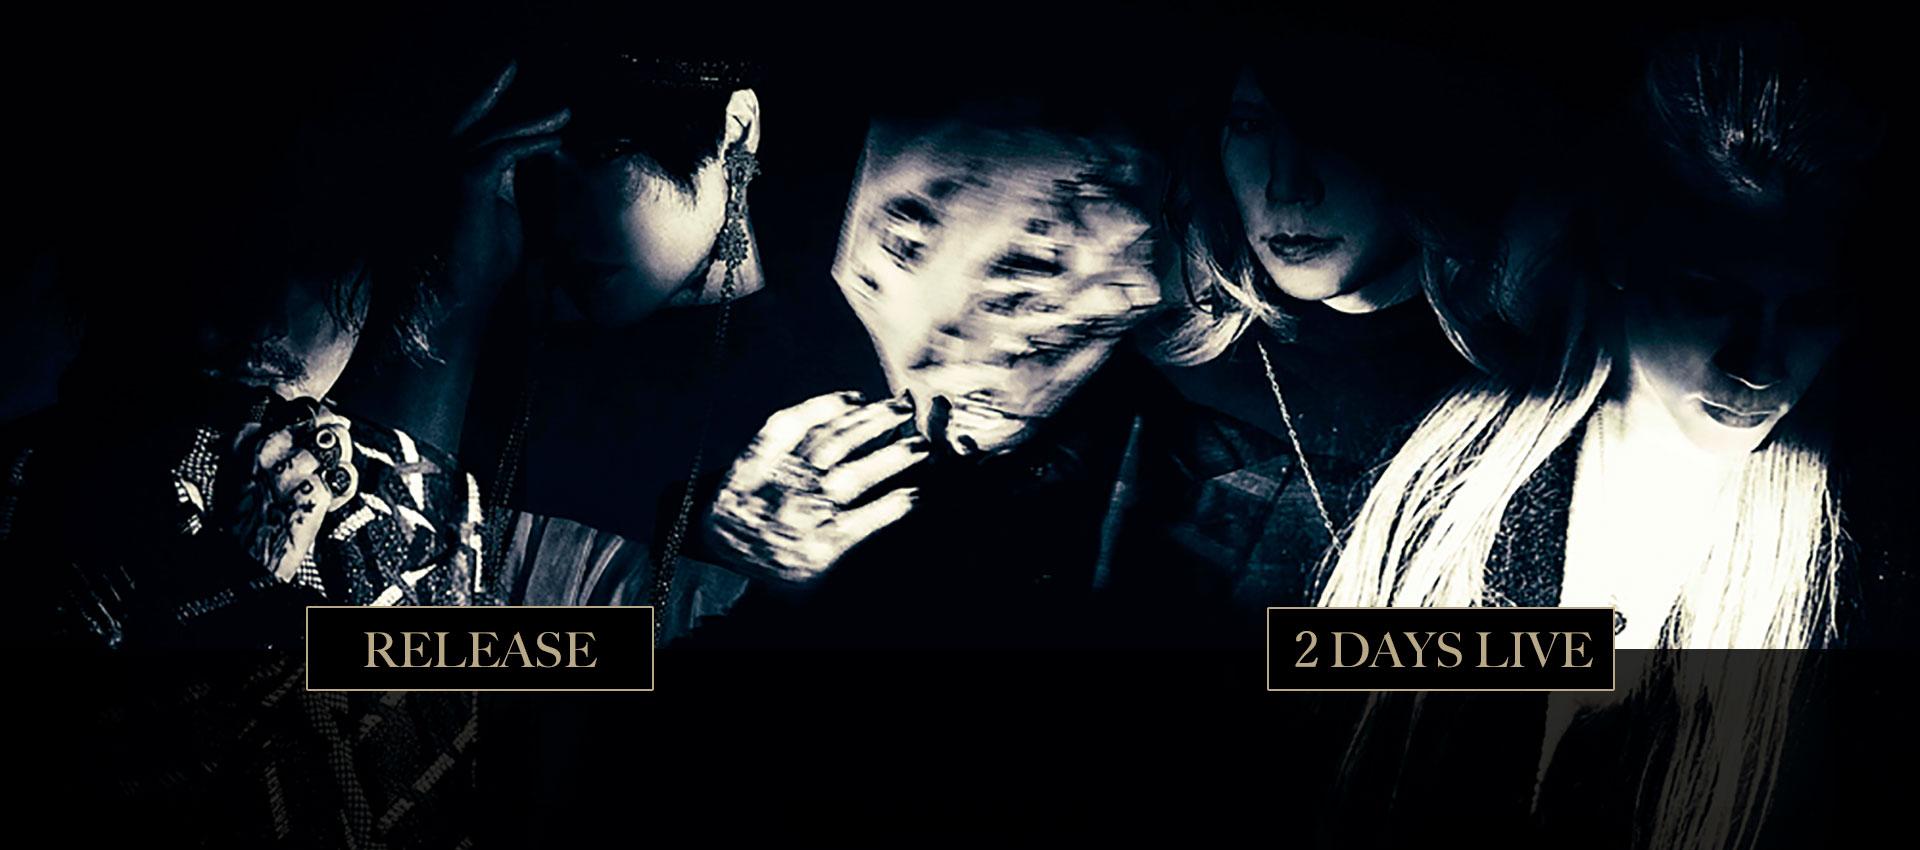 Dir En Grey Official Site